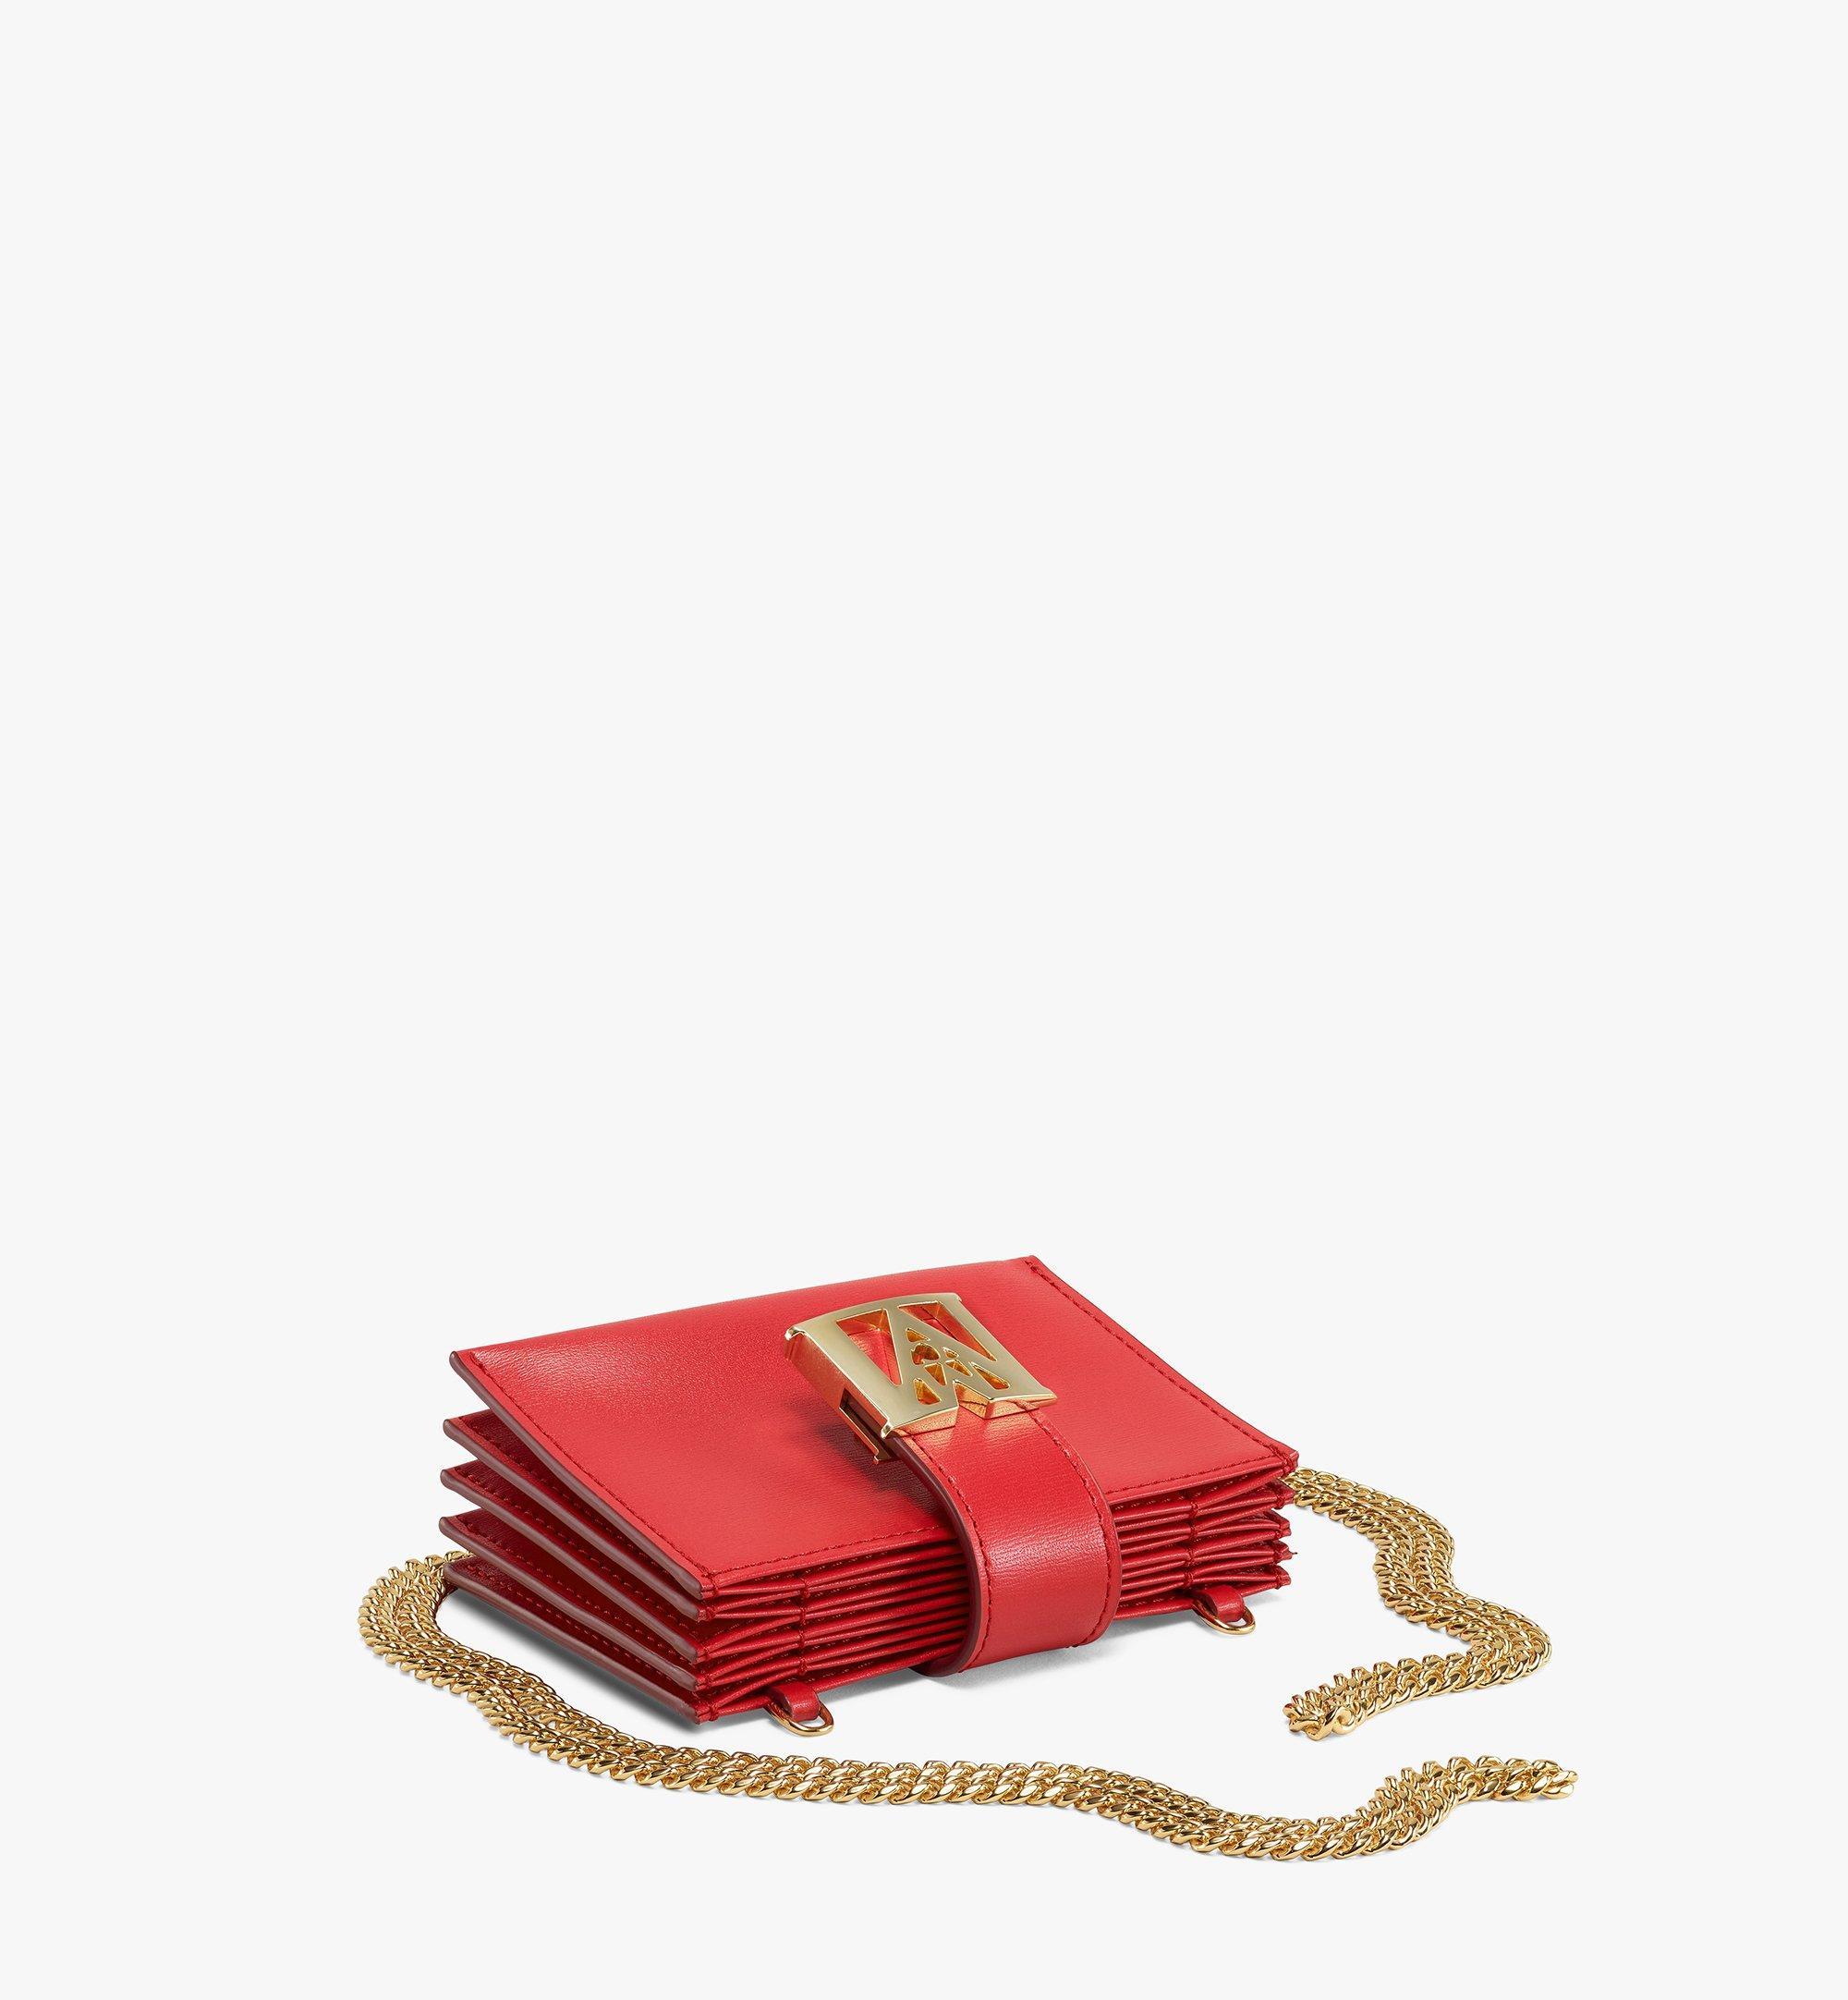 MCM Mena风琴式皮革链条卡包 Red MYABSLM01R4001 更多视角 2